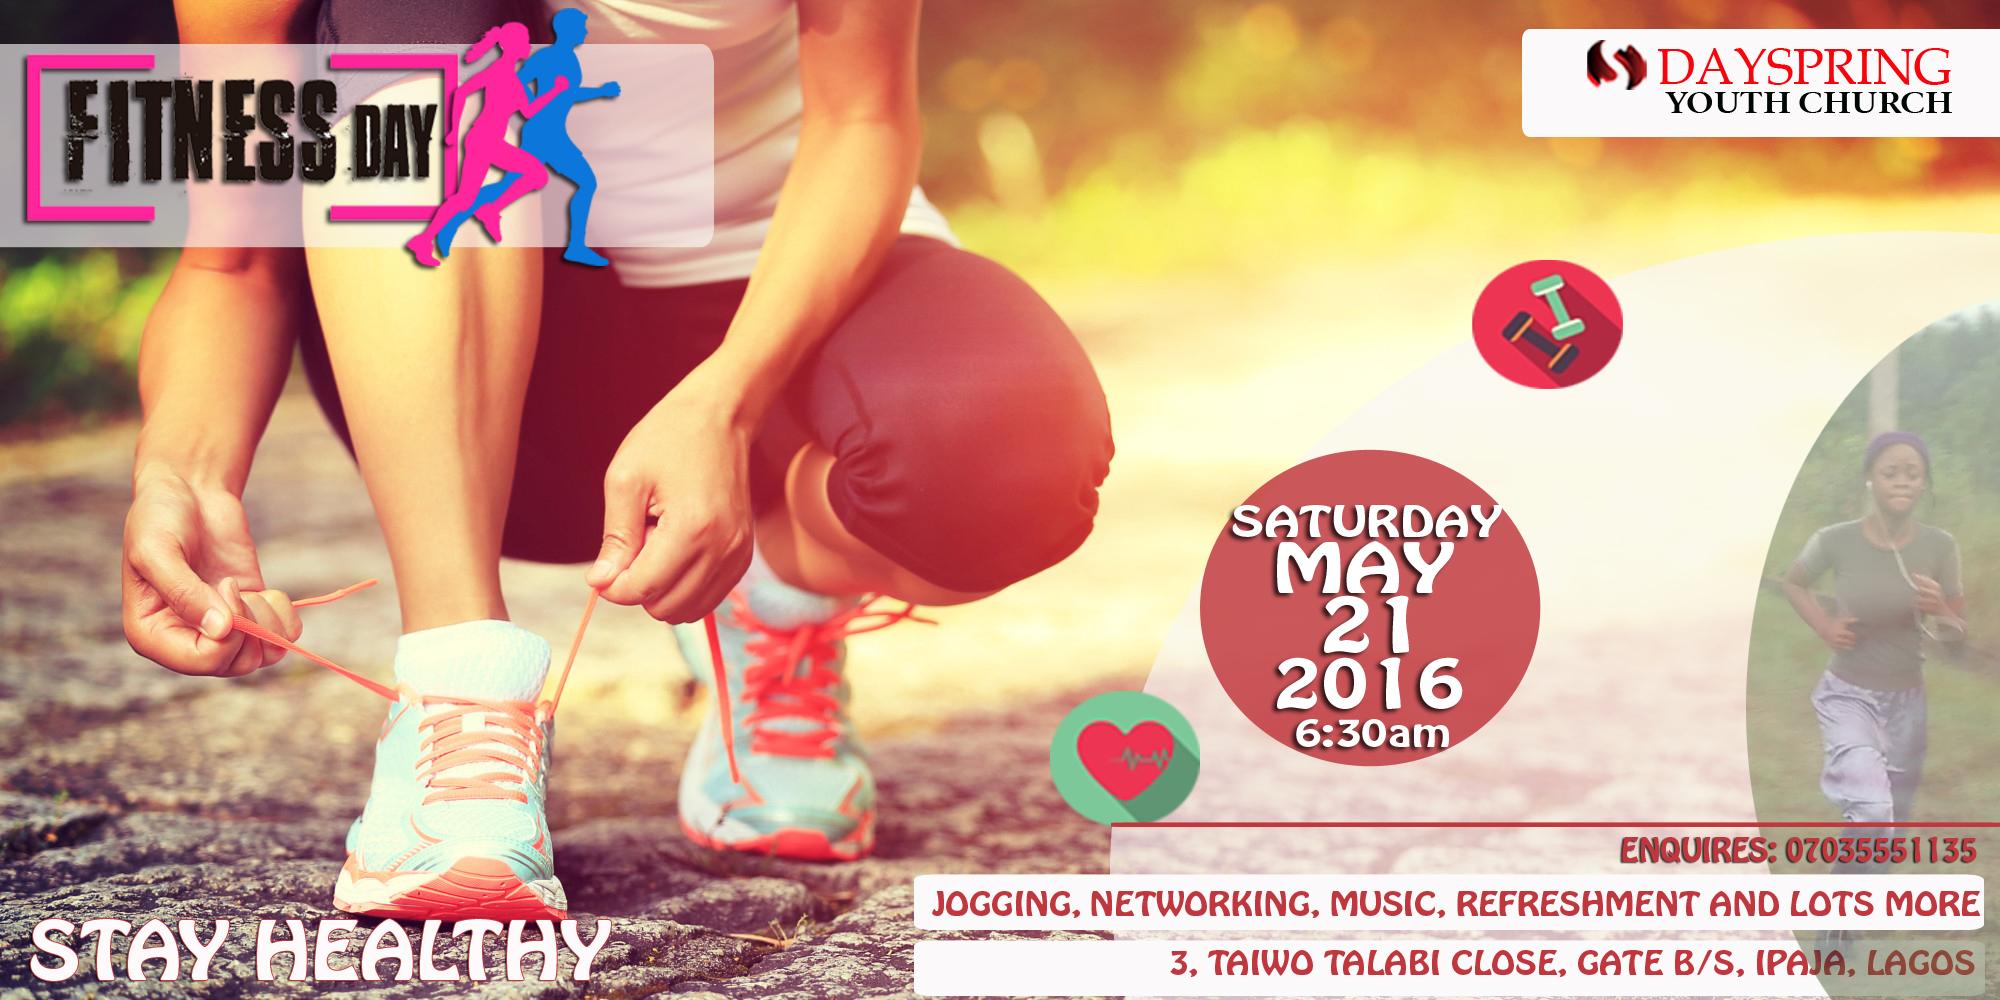 Dayspring Youth Church Fitness Program